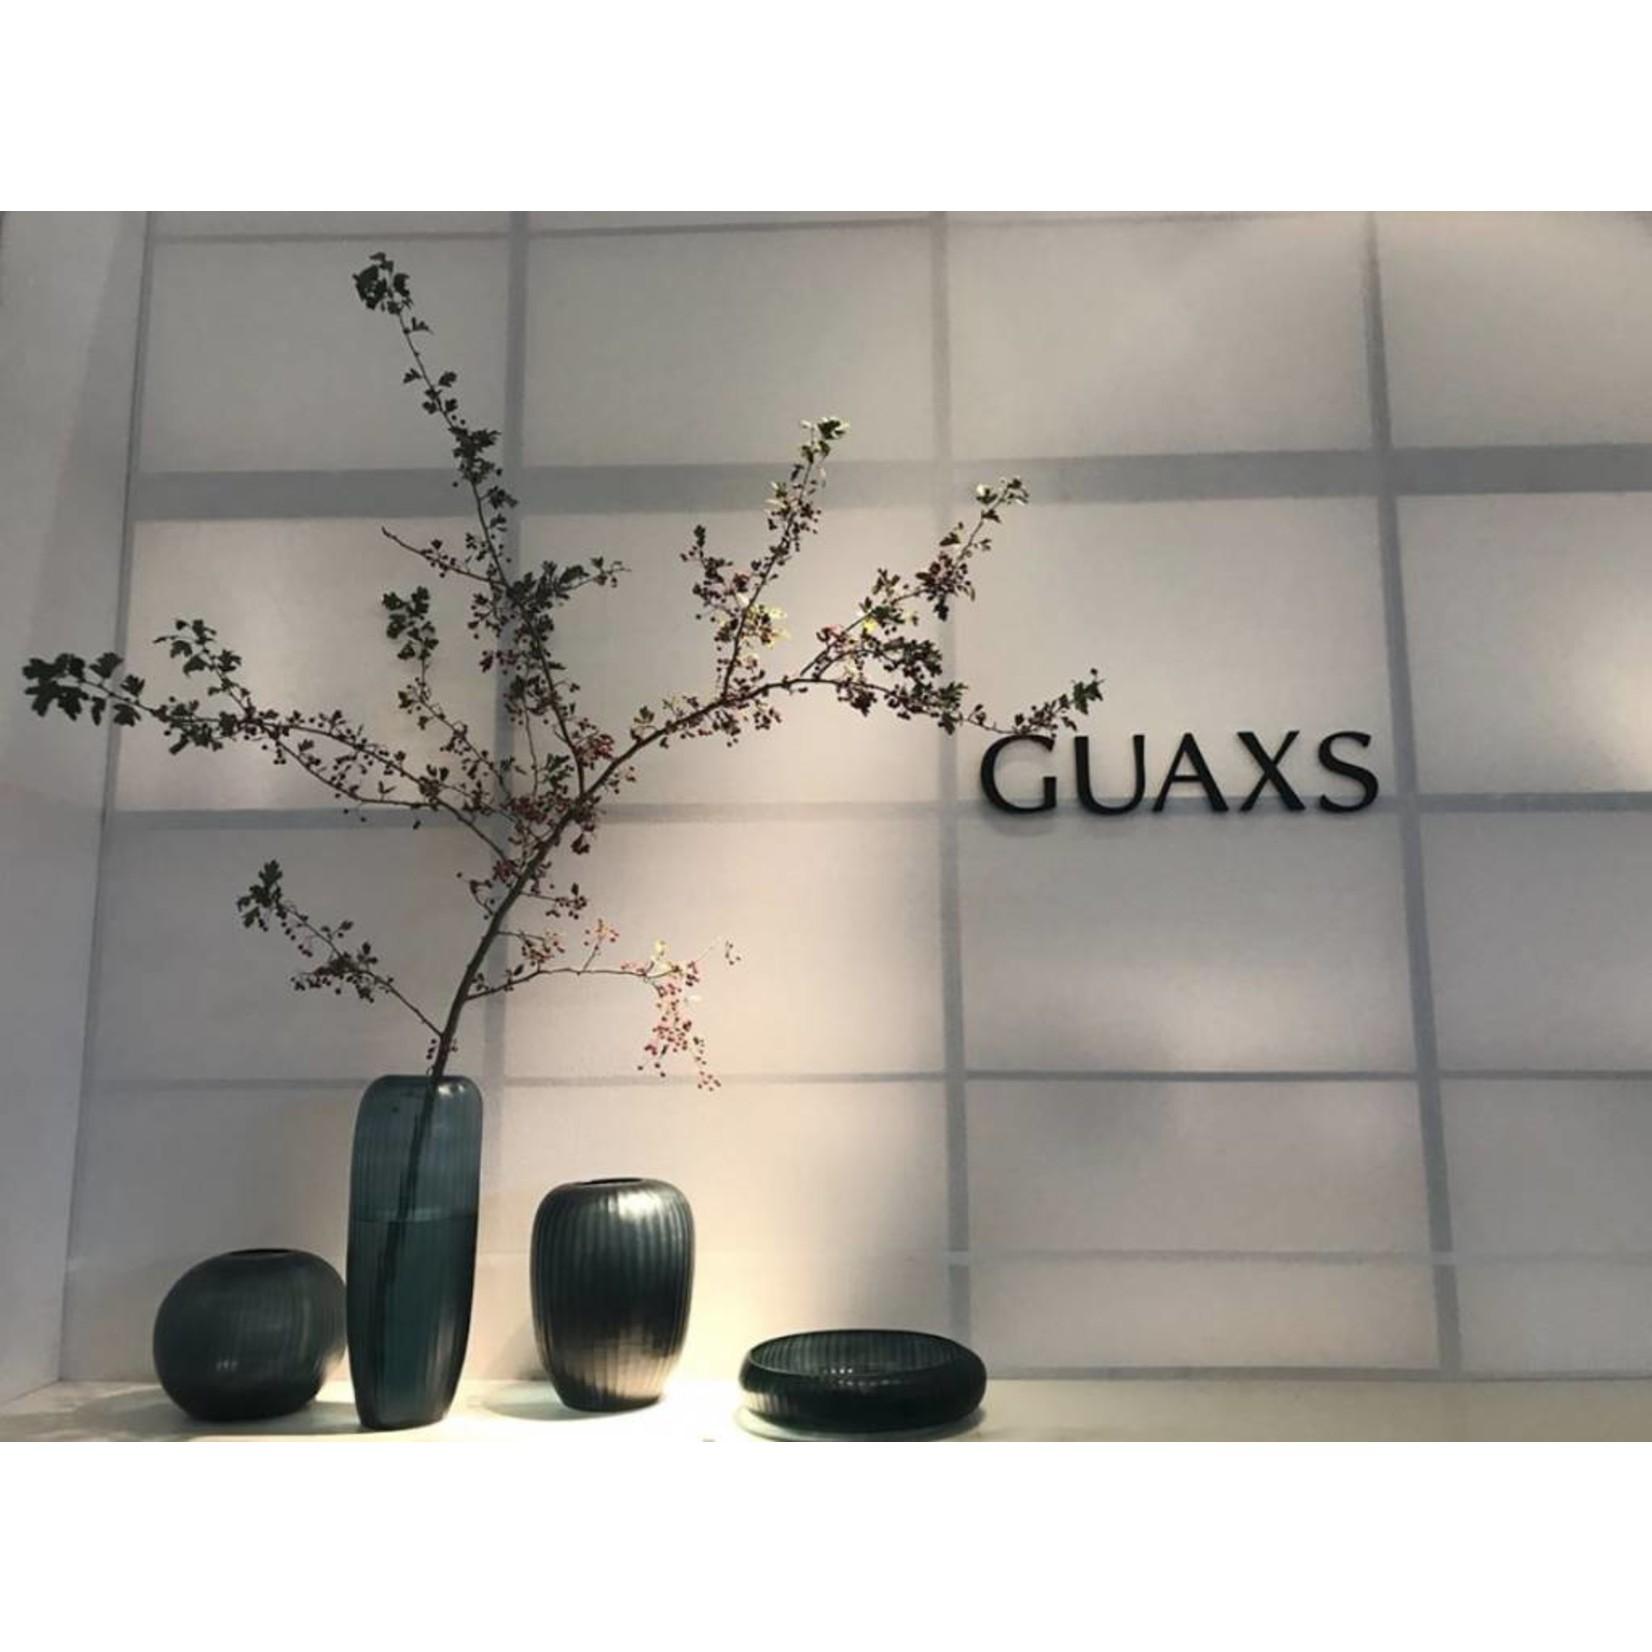 Guaxs Vase Gobi Tall | Ocean Blue / Indigo